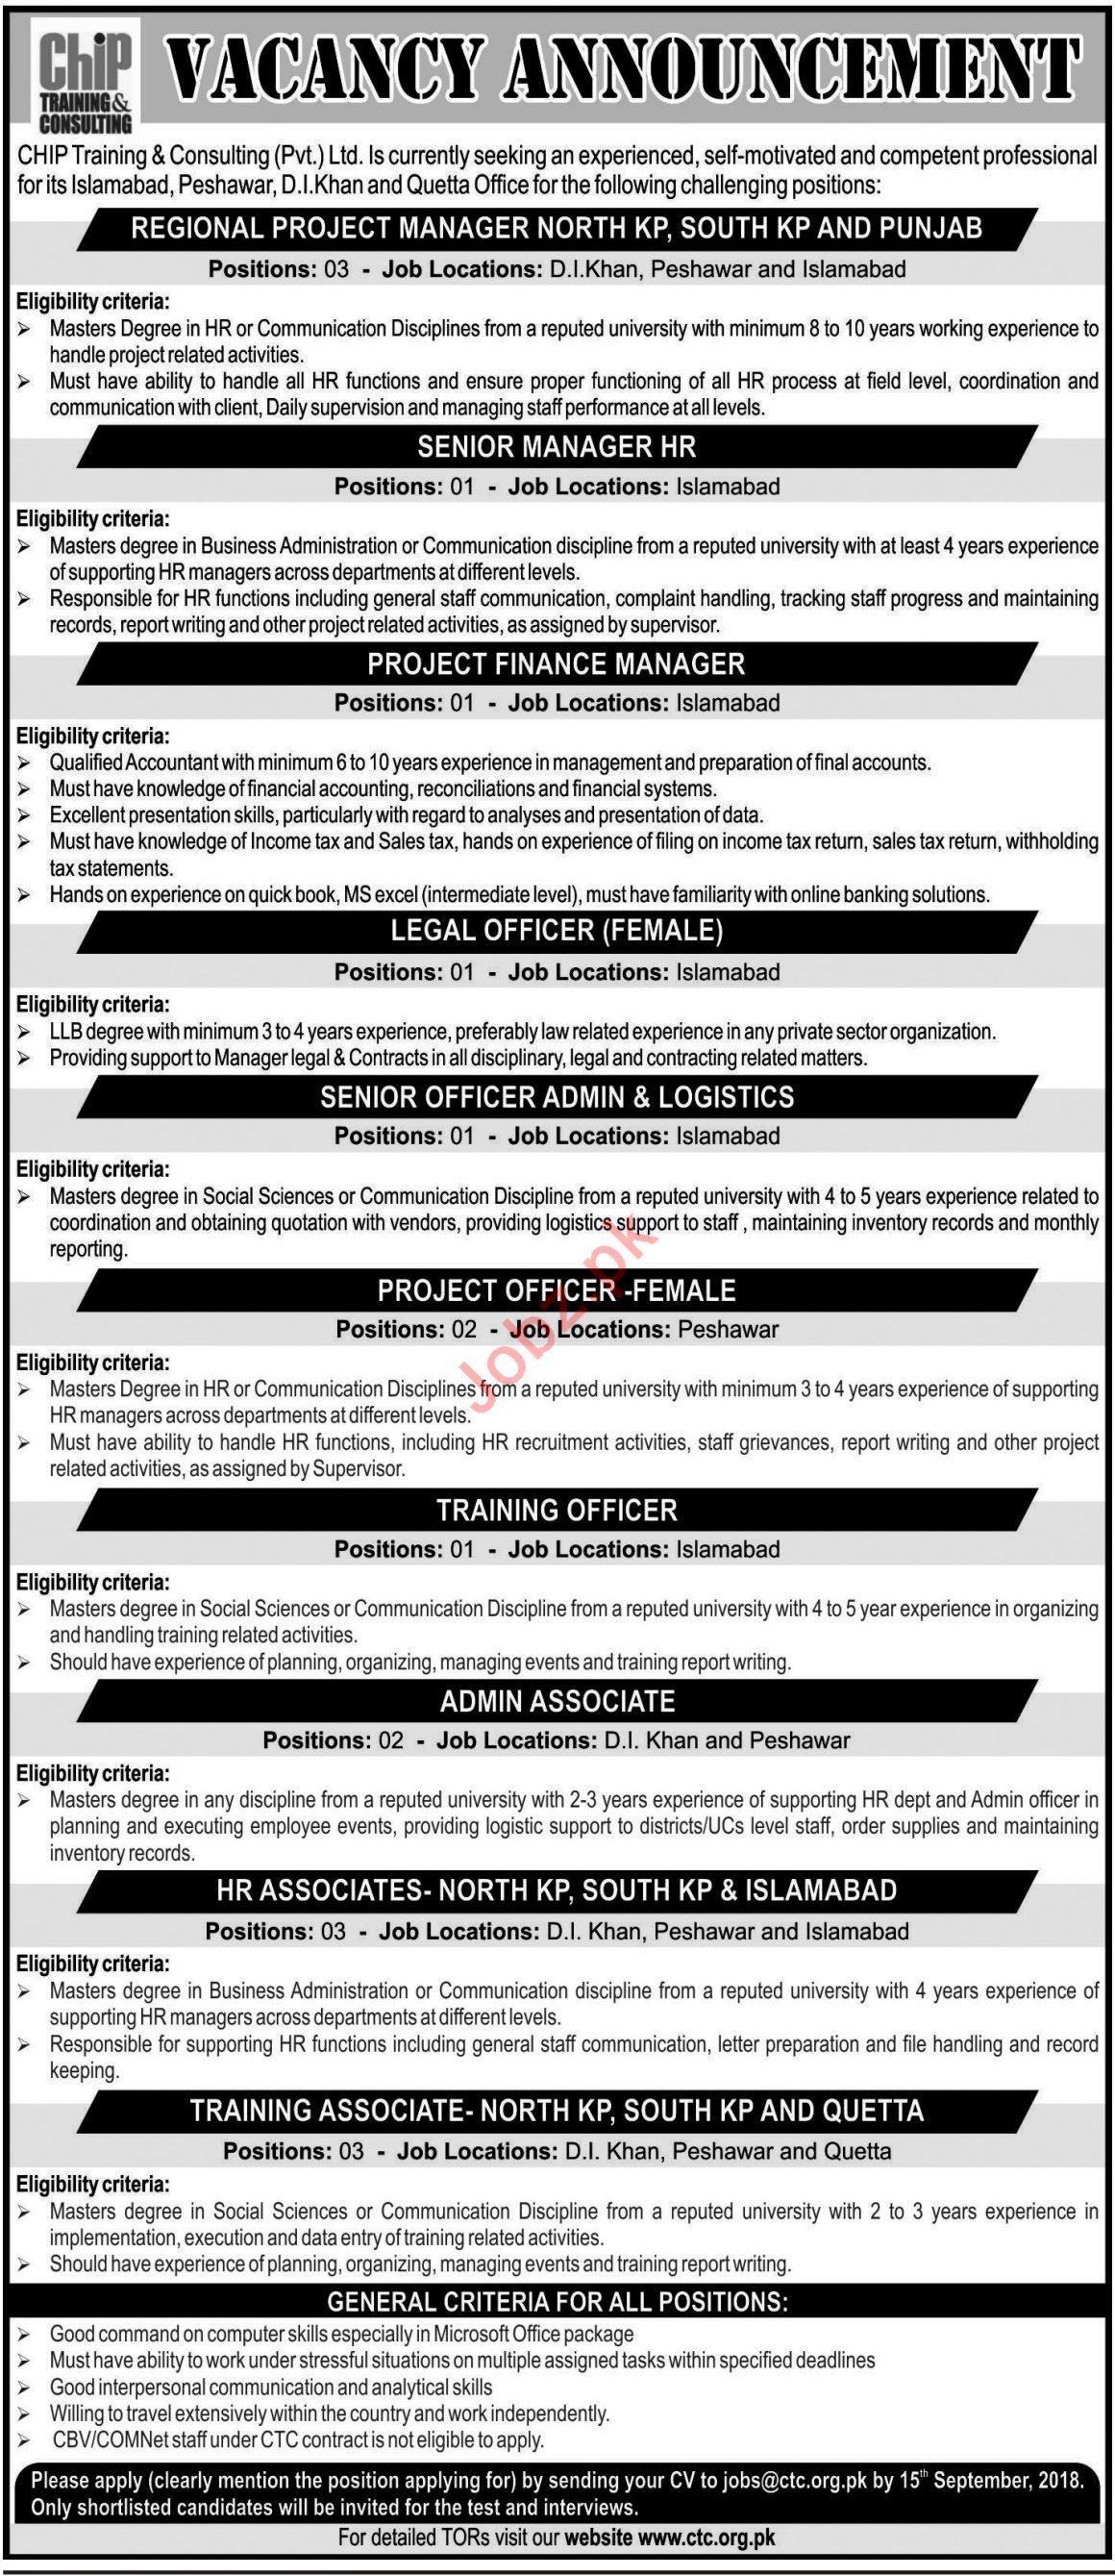 Chip Training & Consulting Pvt Ltd Jobs 2018